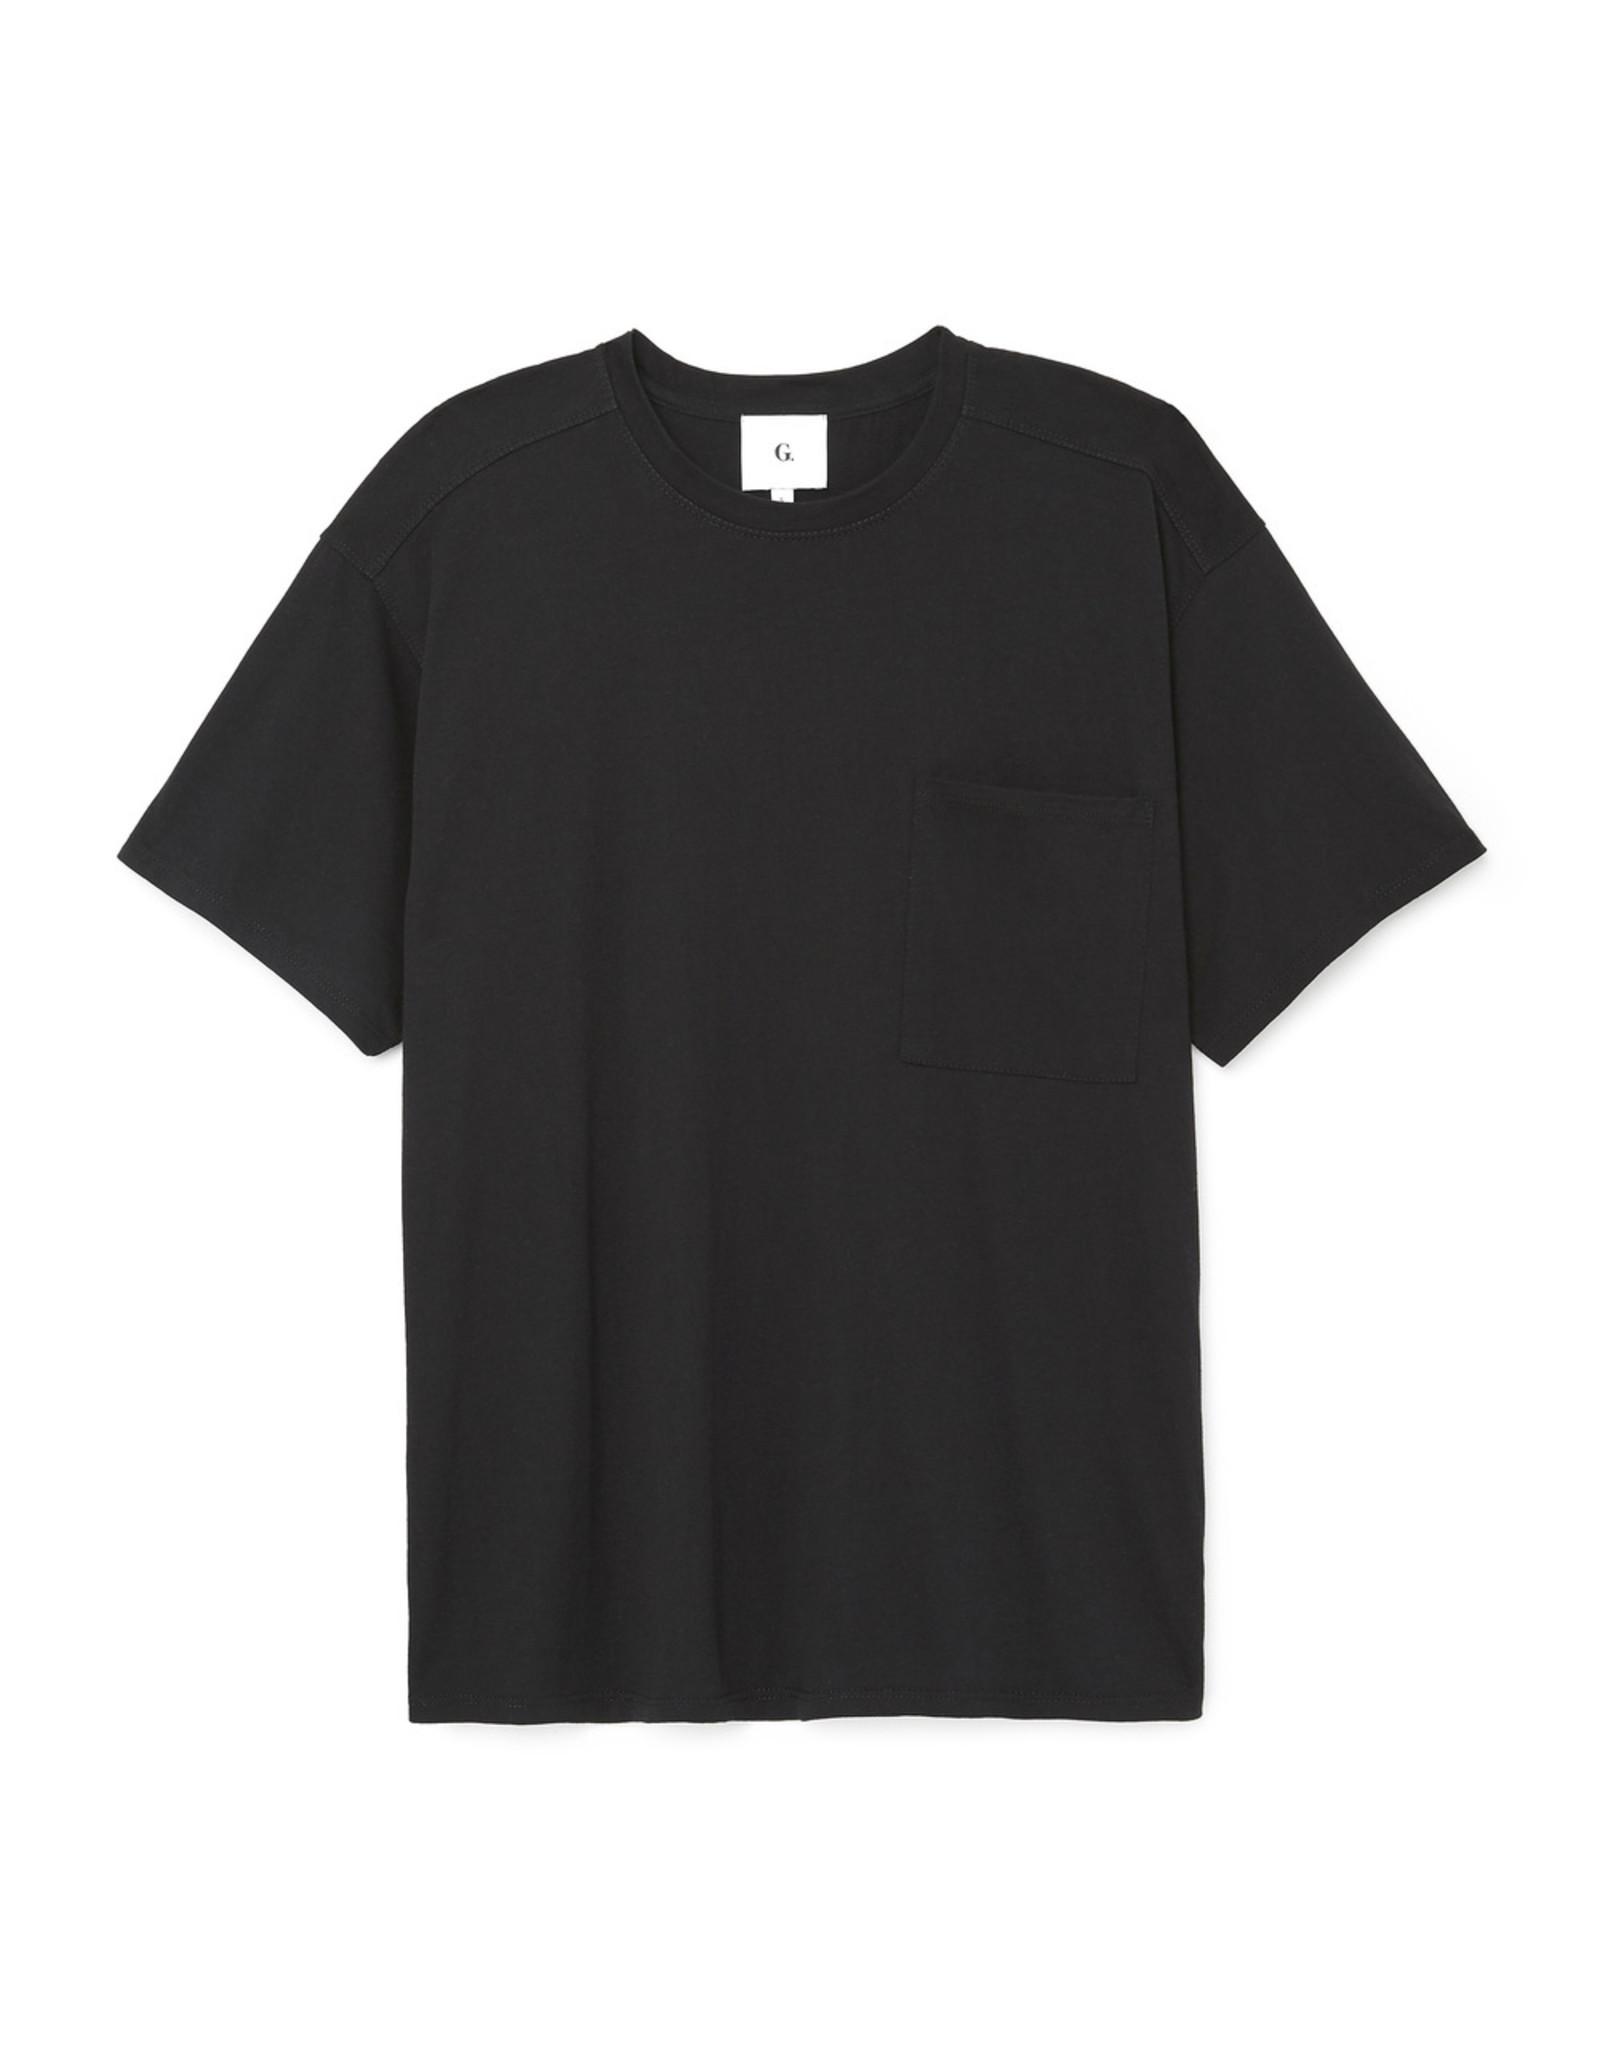 G. Sport G. Sport Oversize Boyfriend Tee (Color: Black, Size: L)